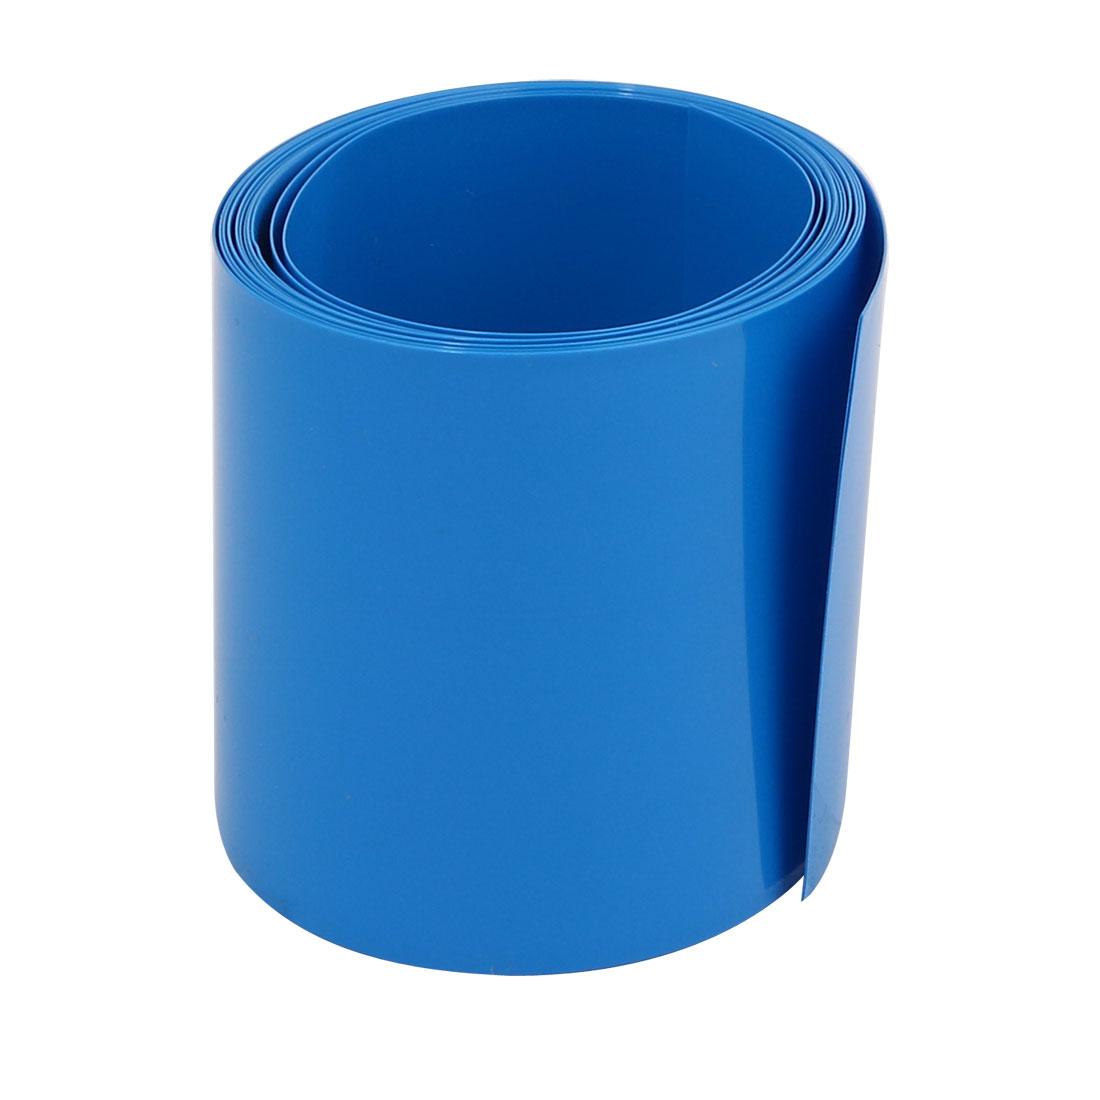 55mm Flat Width 2M Long PVC Heat Shrinkable Tube Blue for AAA Battery Pack